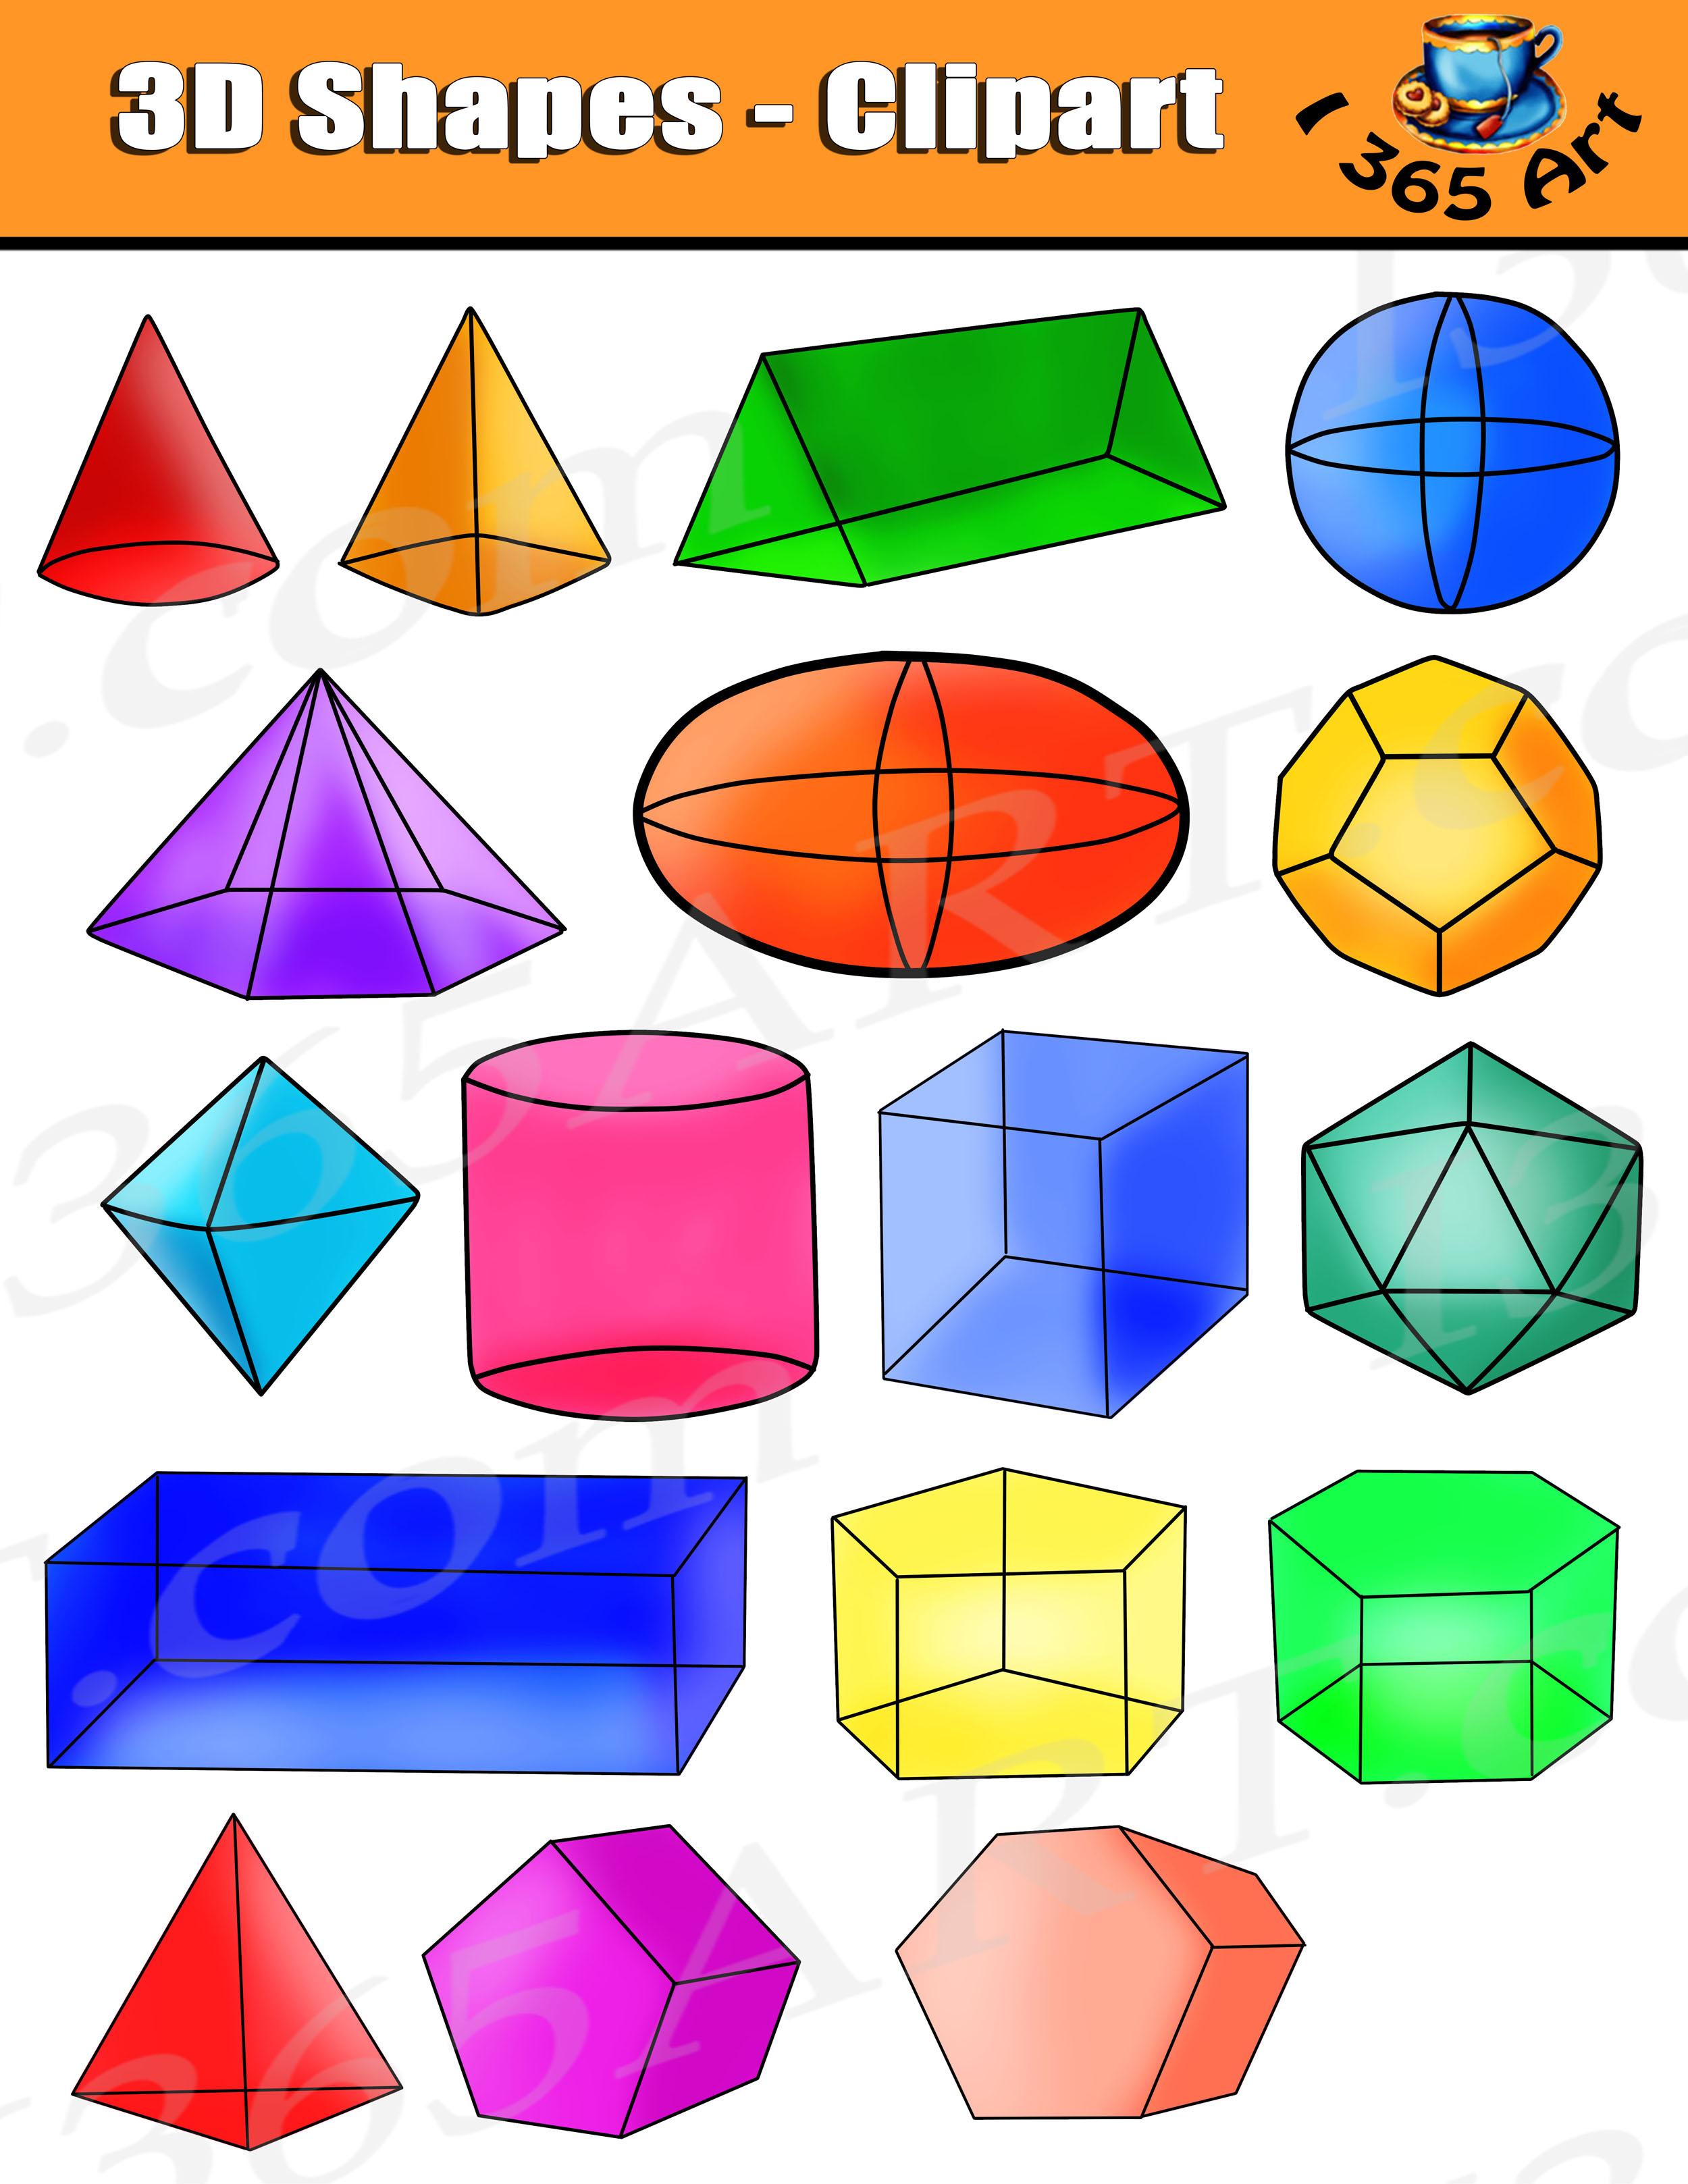 Shapes Clipart, Isometric 3D Shapes Digital Graphics.